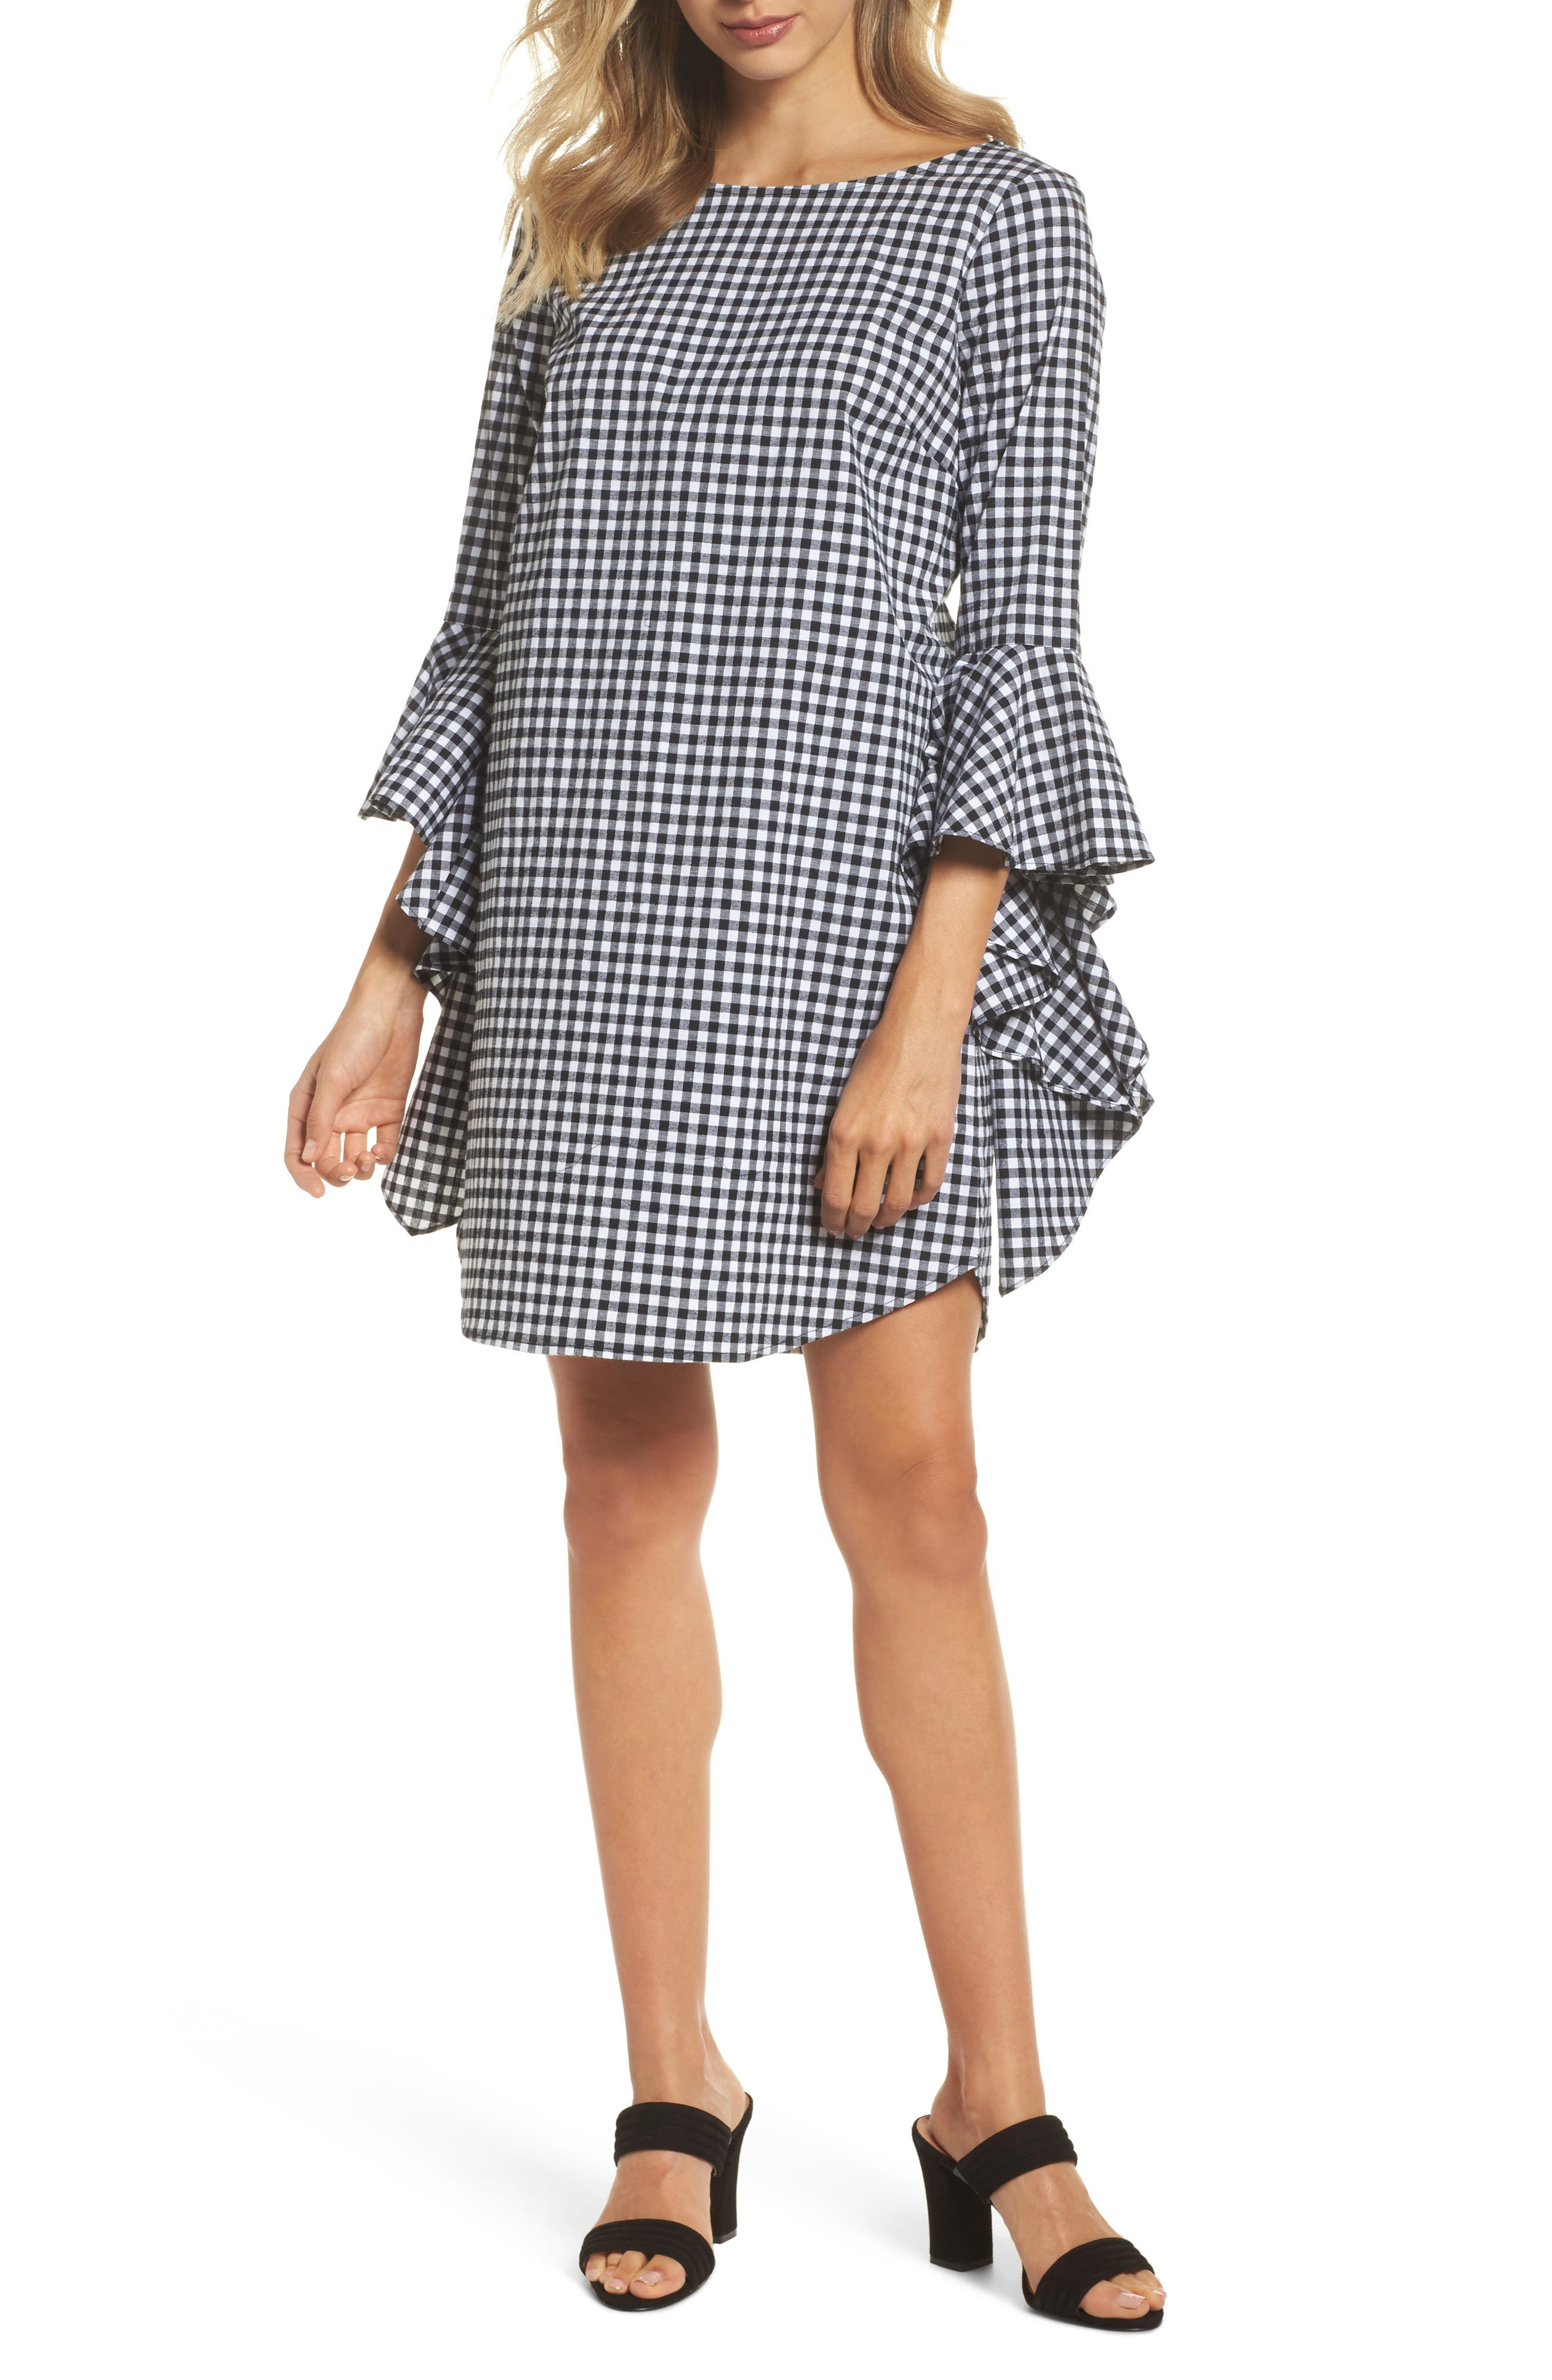 Ruffle Sleeve Gingham Shift Dress,                         Main,                         color, Black/ White Gingham